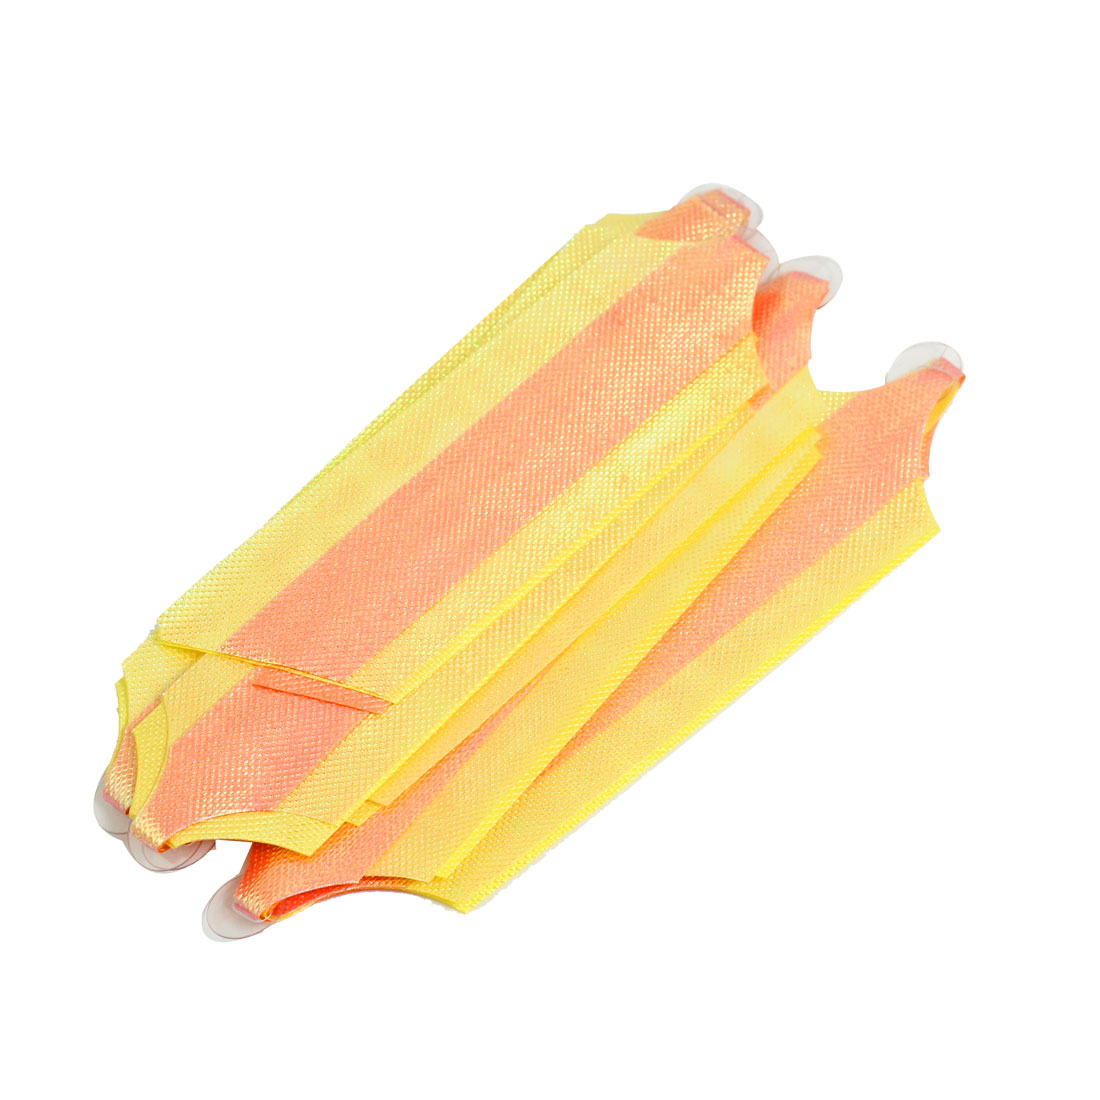 2 Pcs DIY Crafts Pull Flower Ribbon Gift Wrap Ornament Orange Yellow